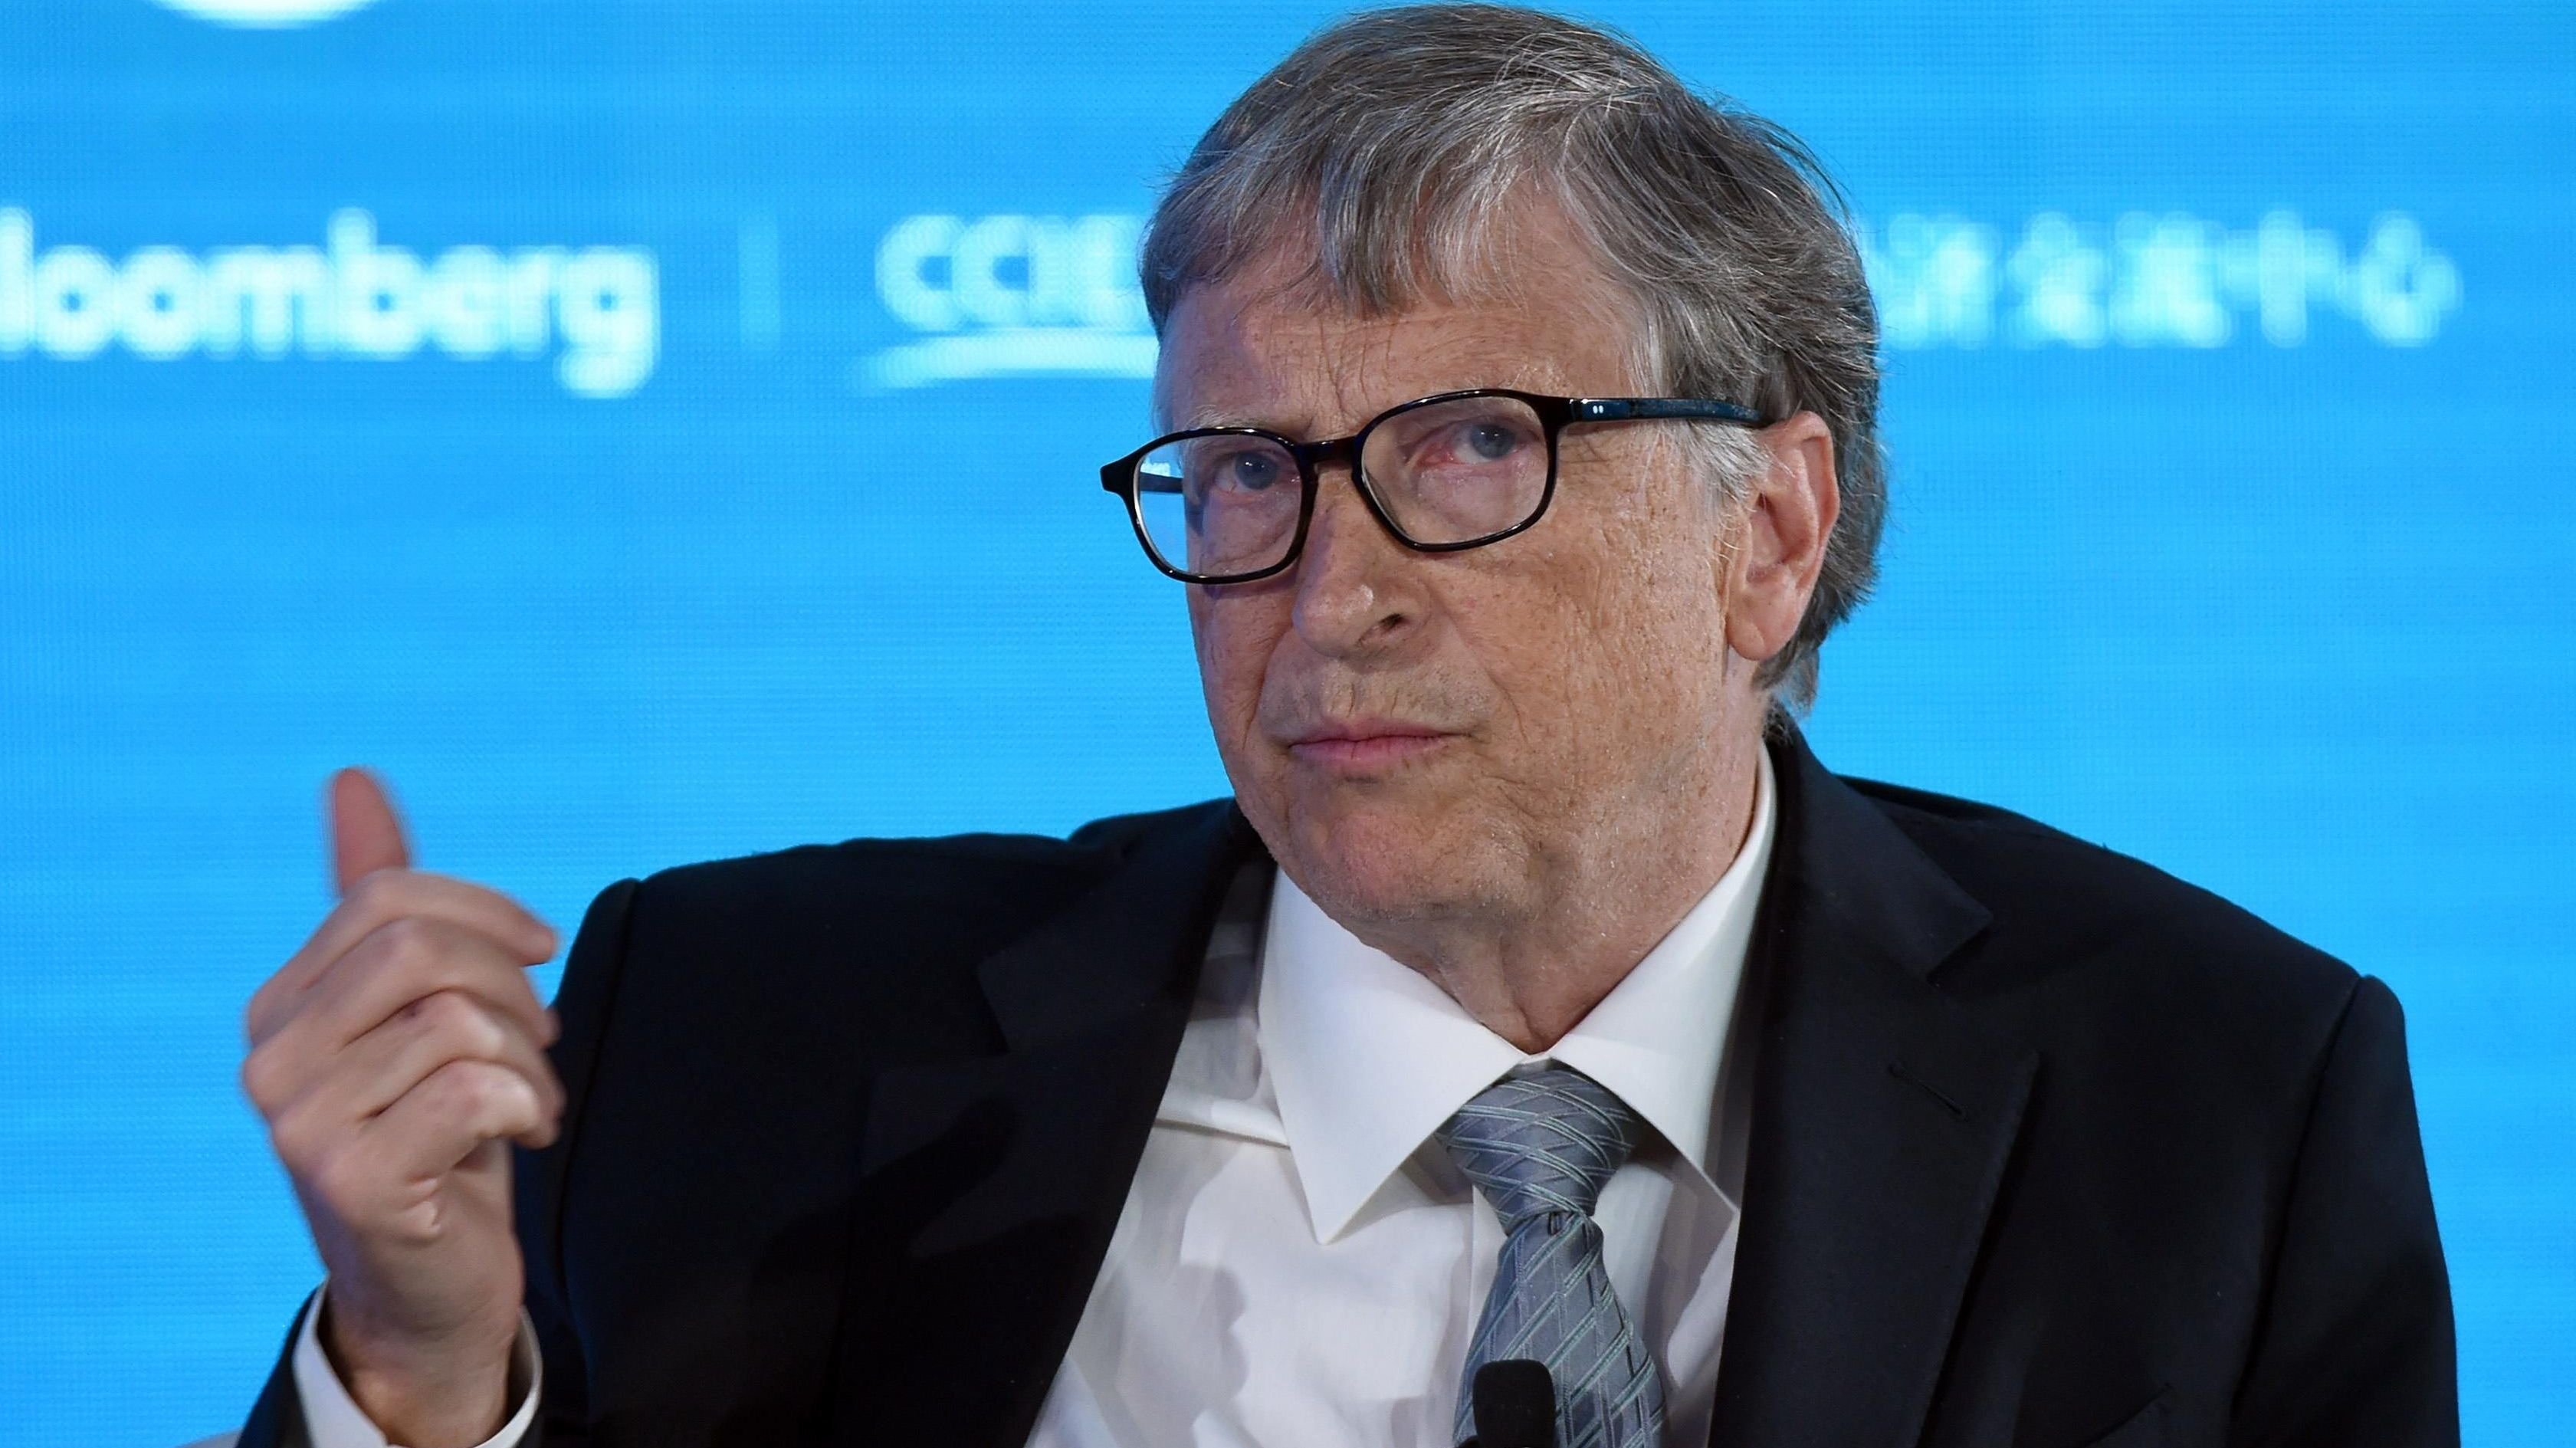 Archiv: Bill Gates bei New Economy Forum in China 21. November 2019